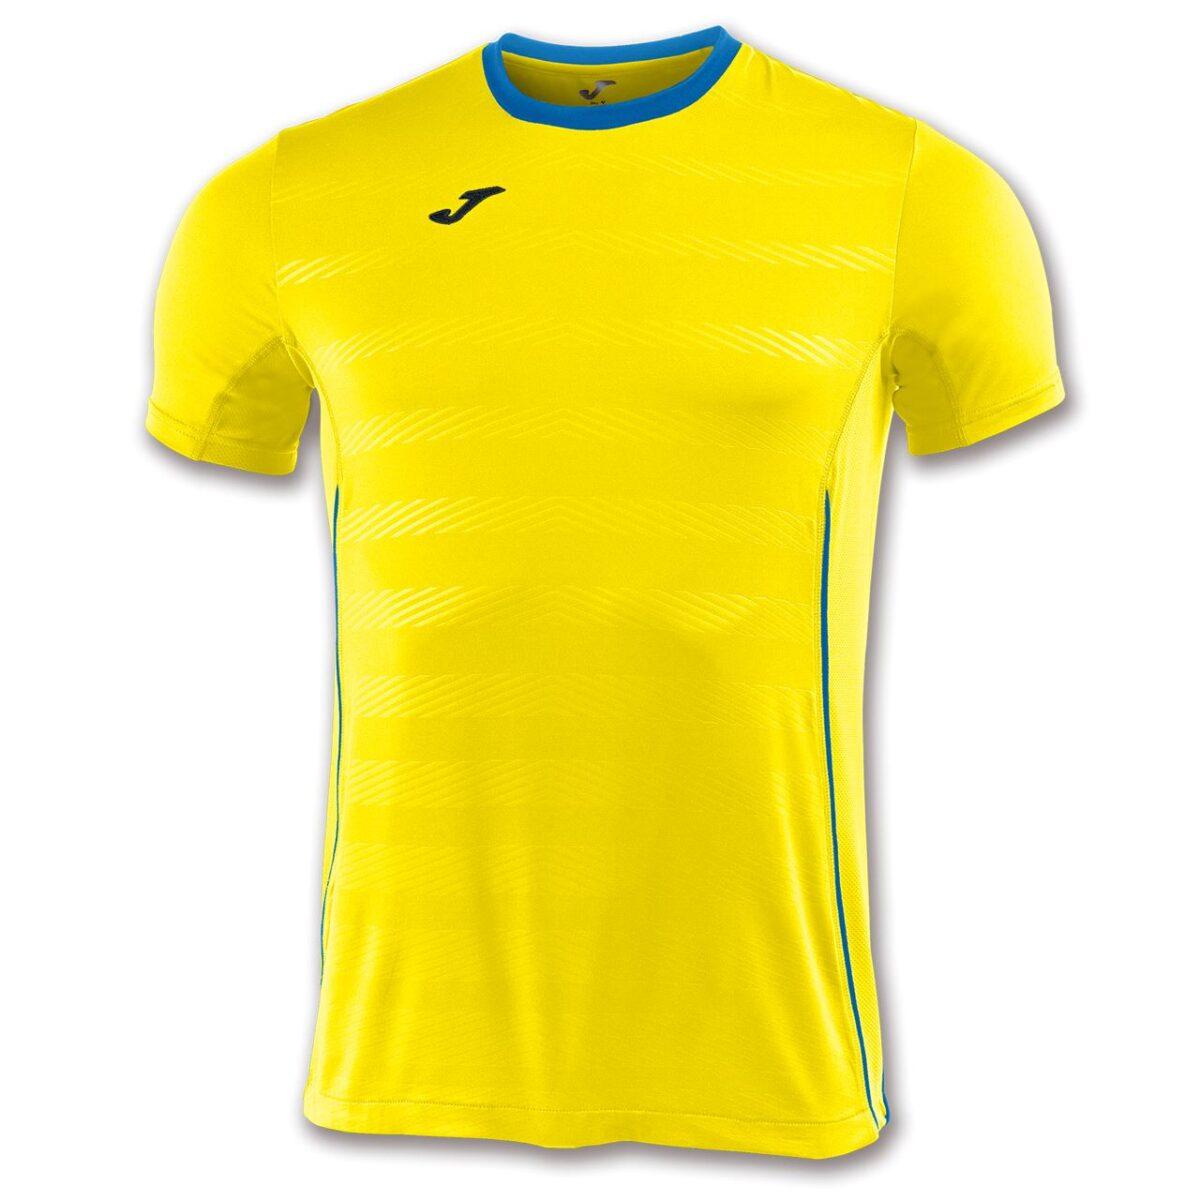 Joma Modena Volleyball Shirt 100694 - Adult